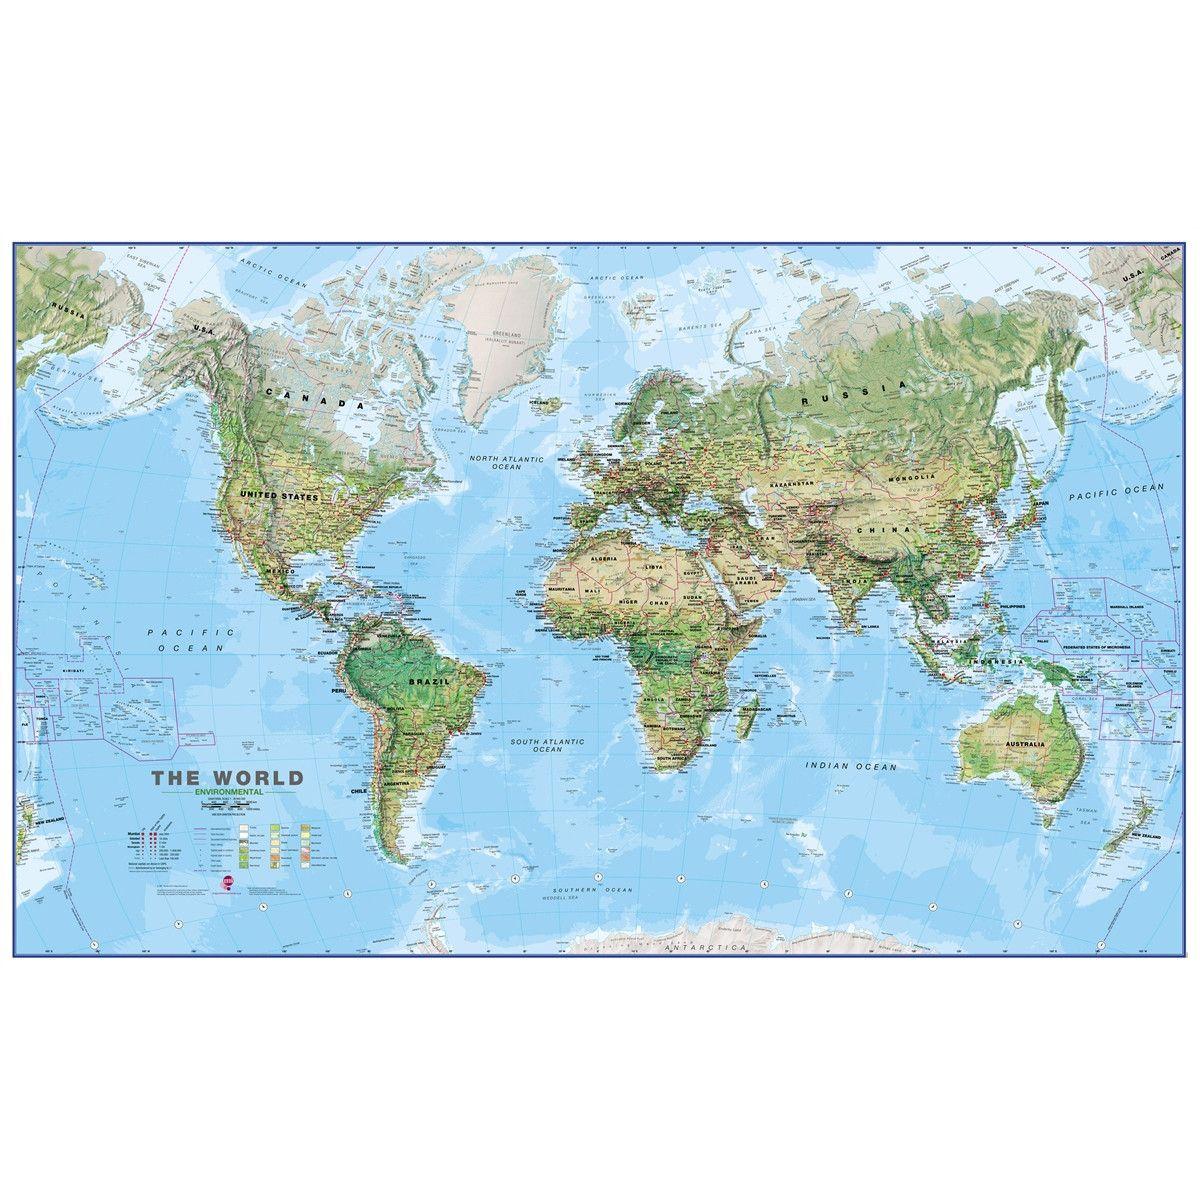 world physical environment 1 20 laminated map wall mural on laminated wall maps id=30560